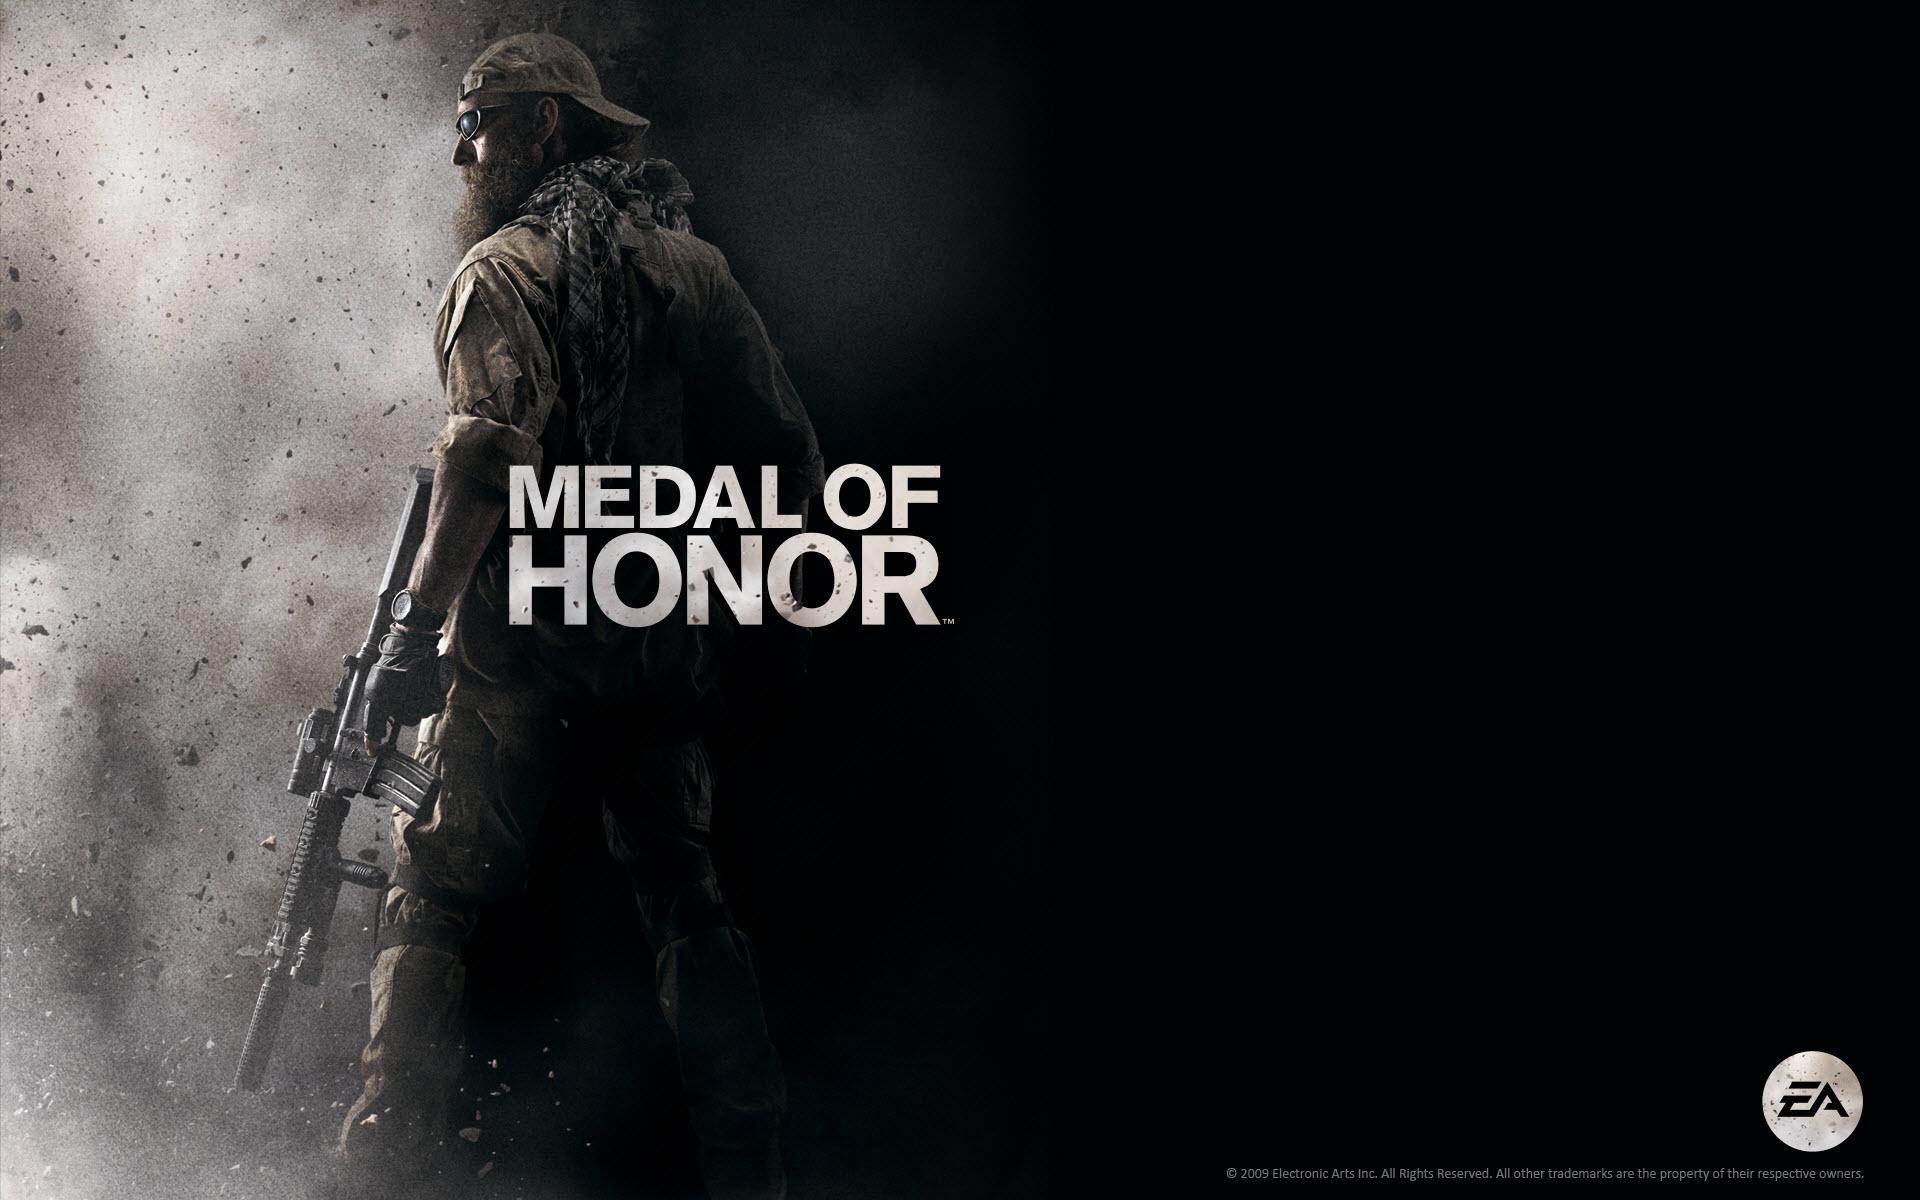 Medal Of Honor 2010 Game Hd Wallpaper